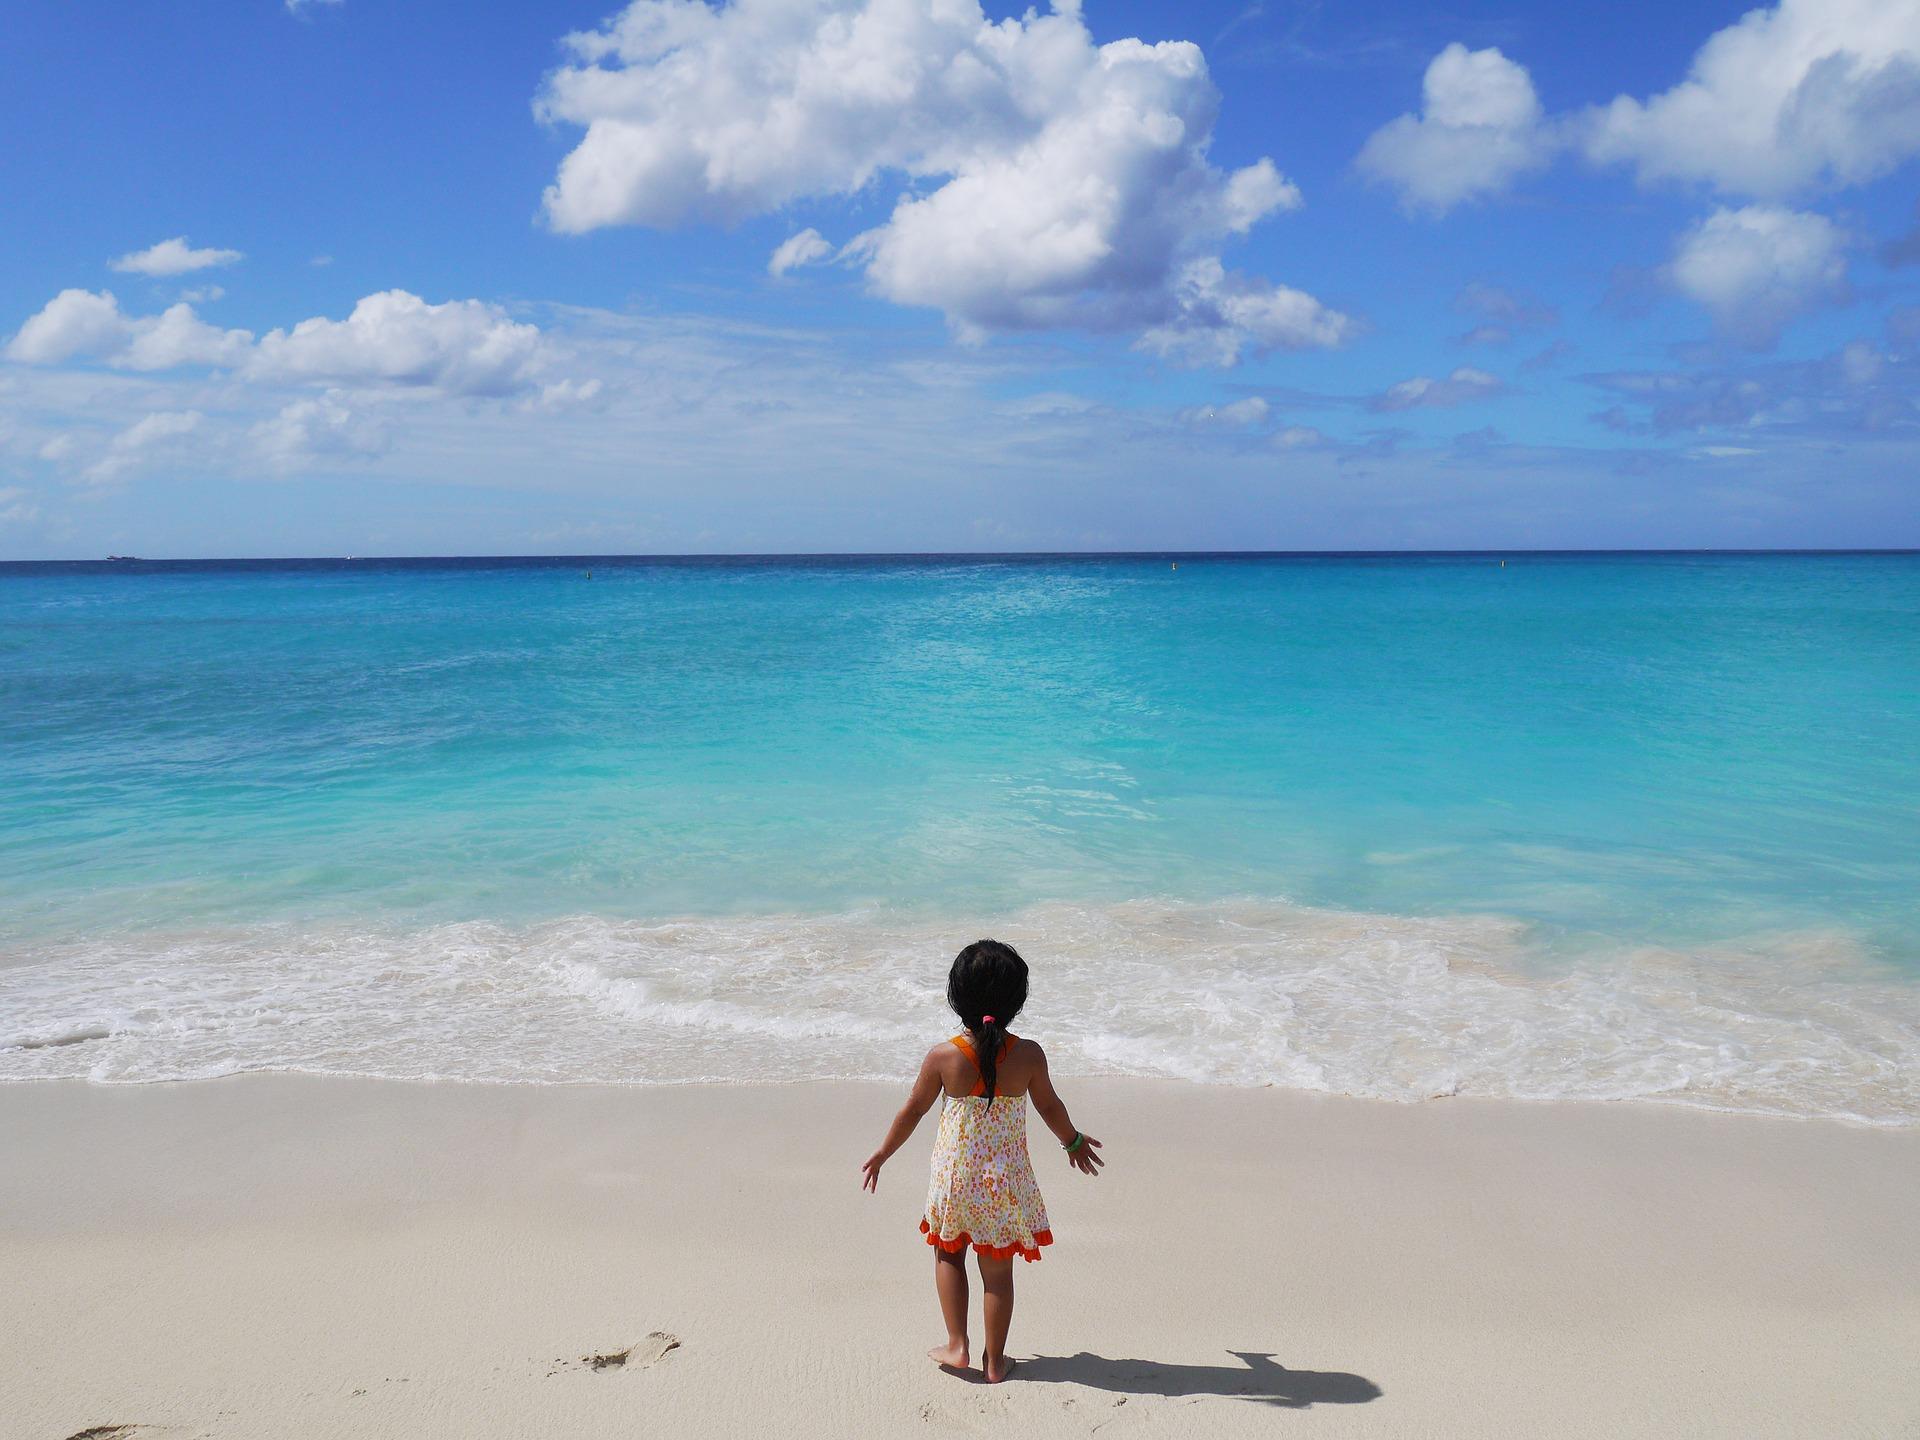 Bambini e spiagge